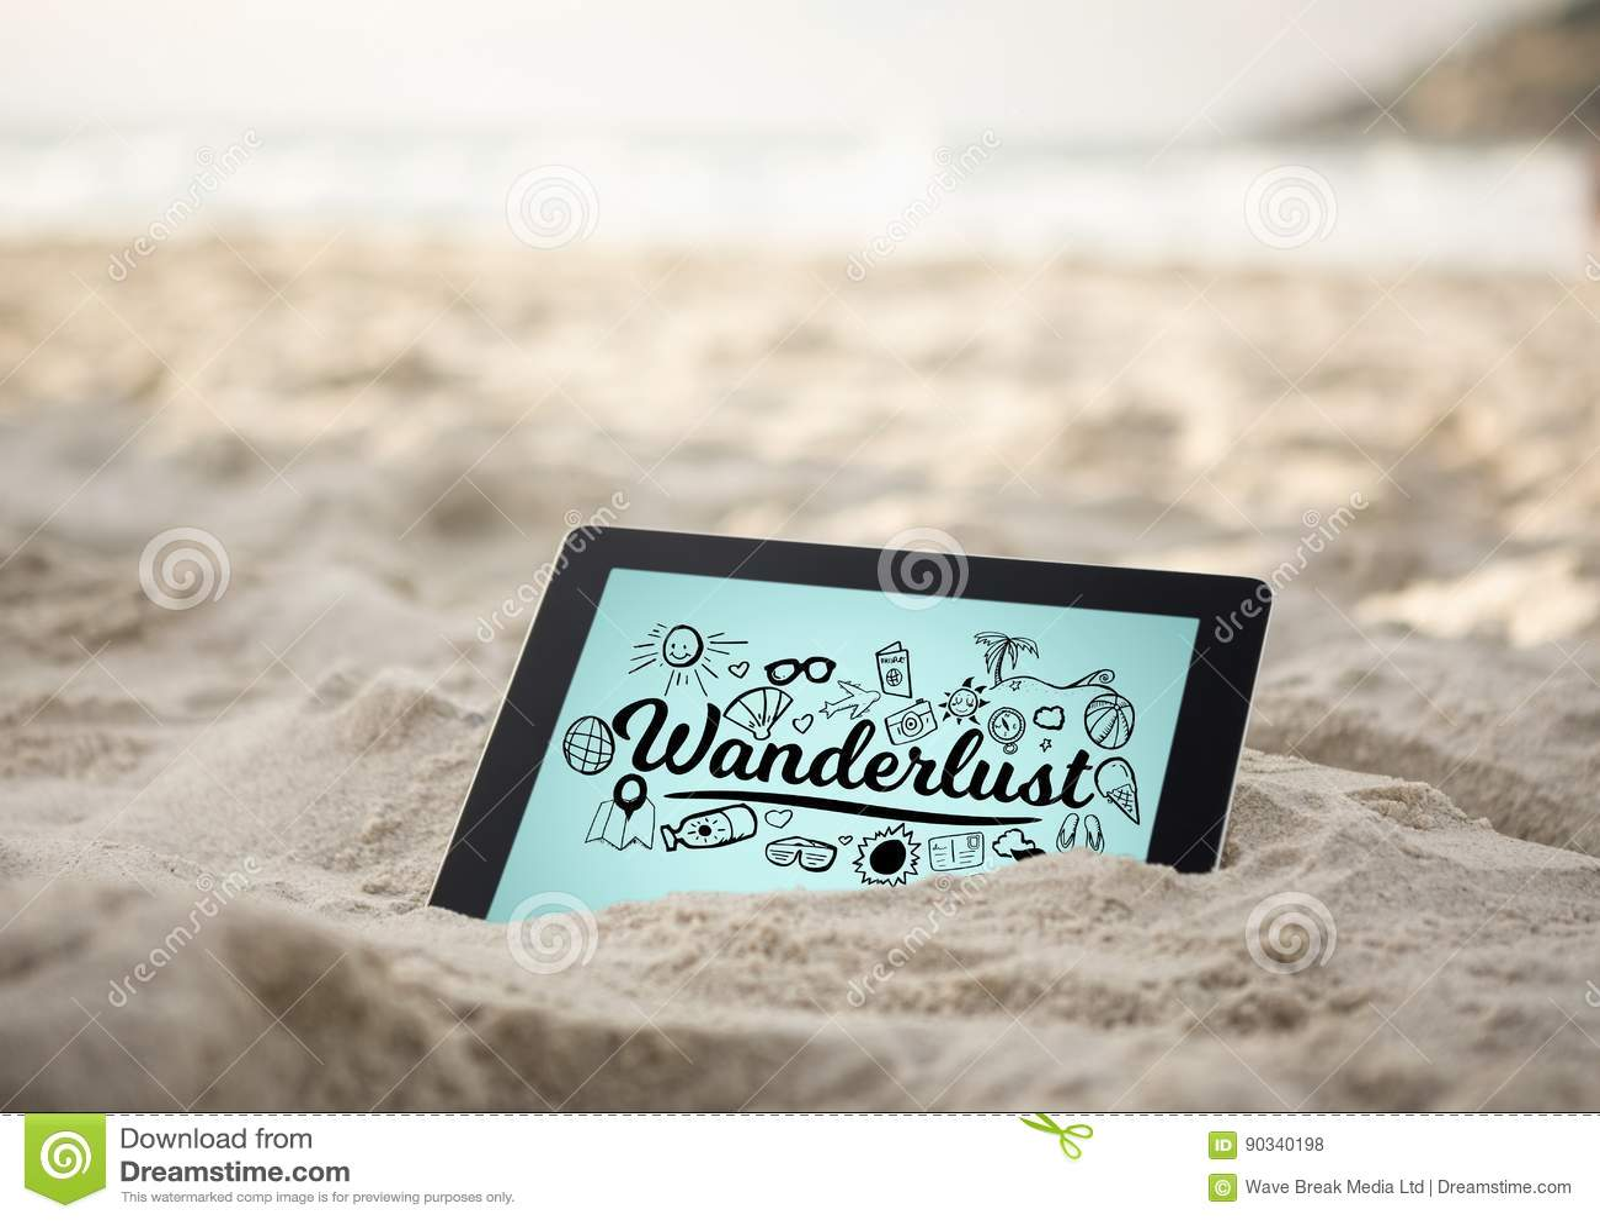 Tablet in sand with black wanderlust doodles against blue background